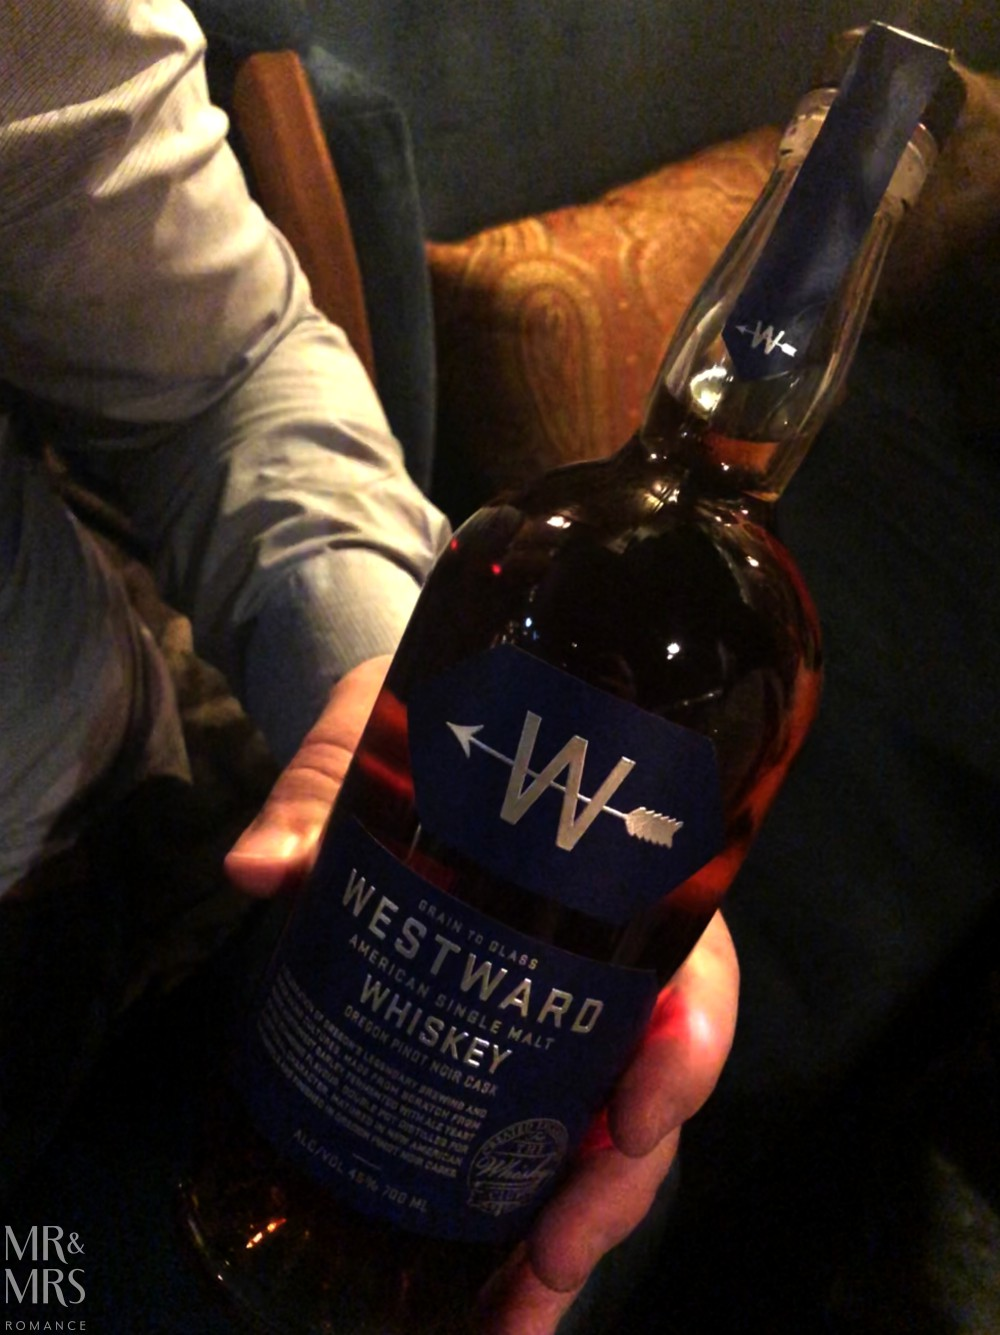 Westward Distillery single malt Pinot Noir expression